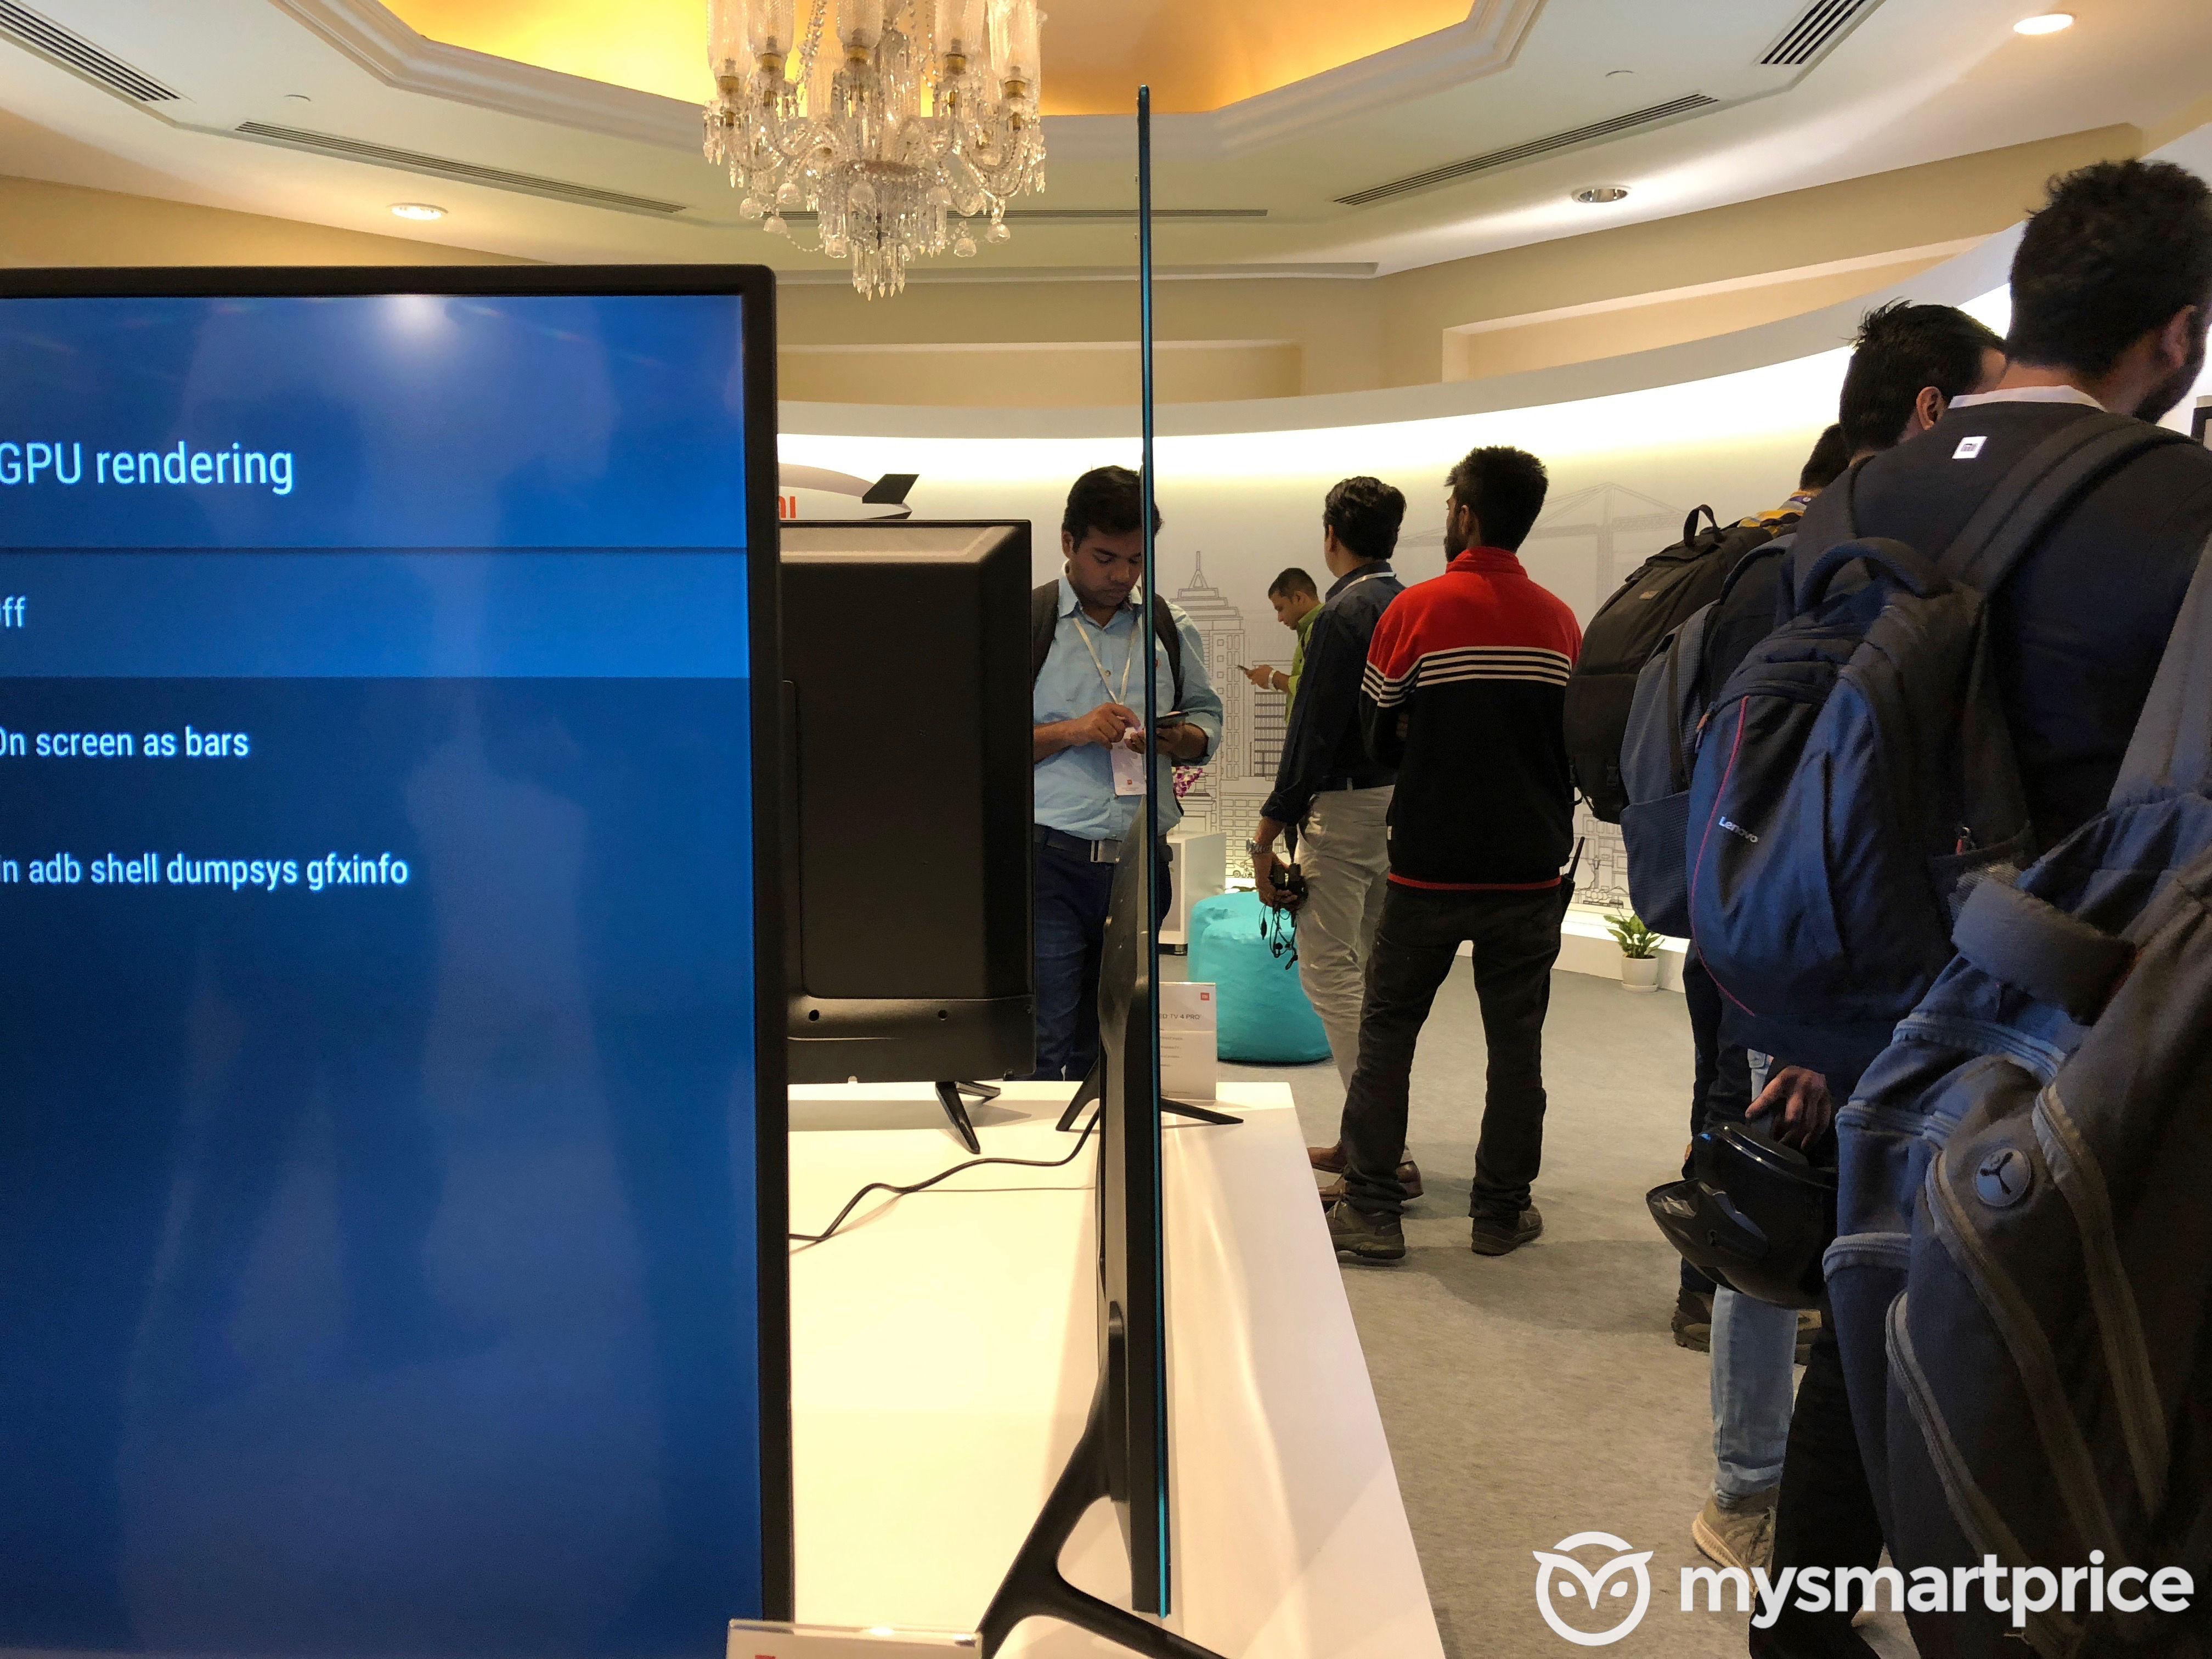 Mi TV 4 Pro 55-inch, Mi TV 4A Pro 49-inch, Mi TV 4C Pro 32